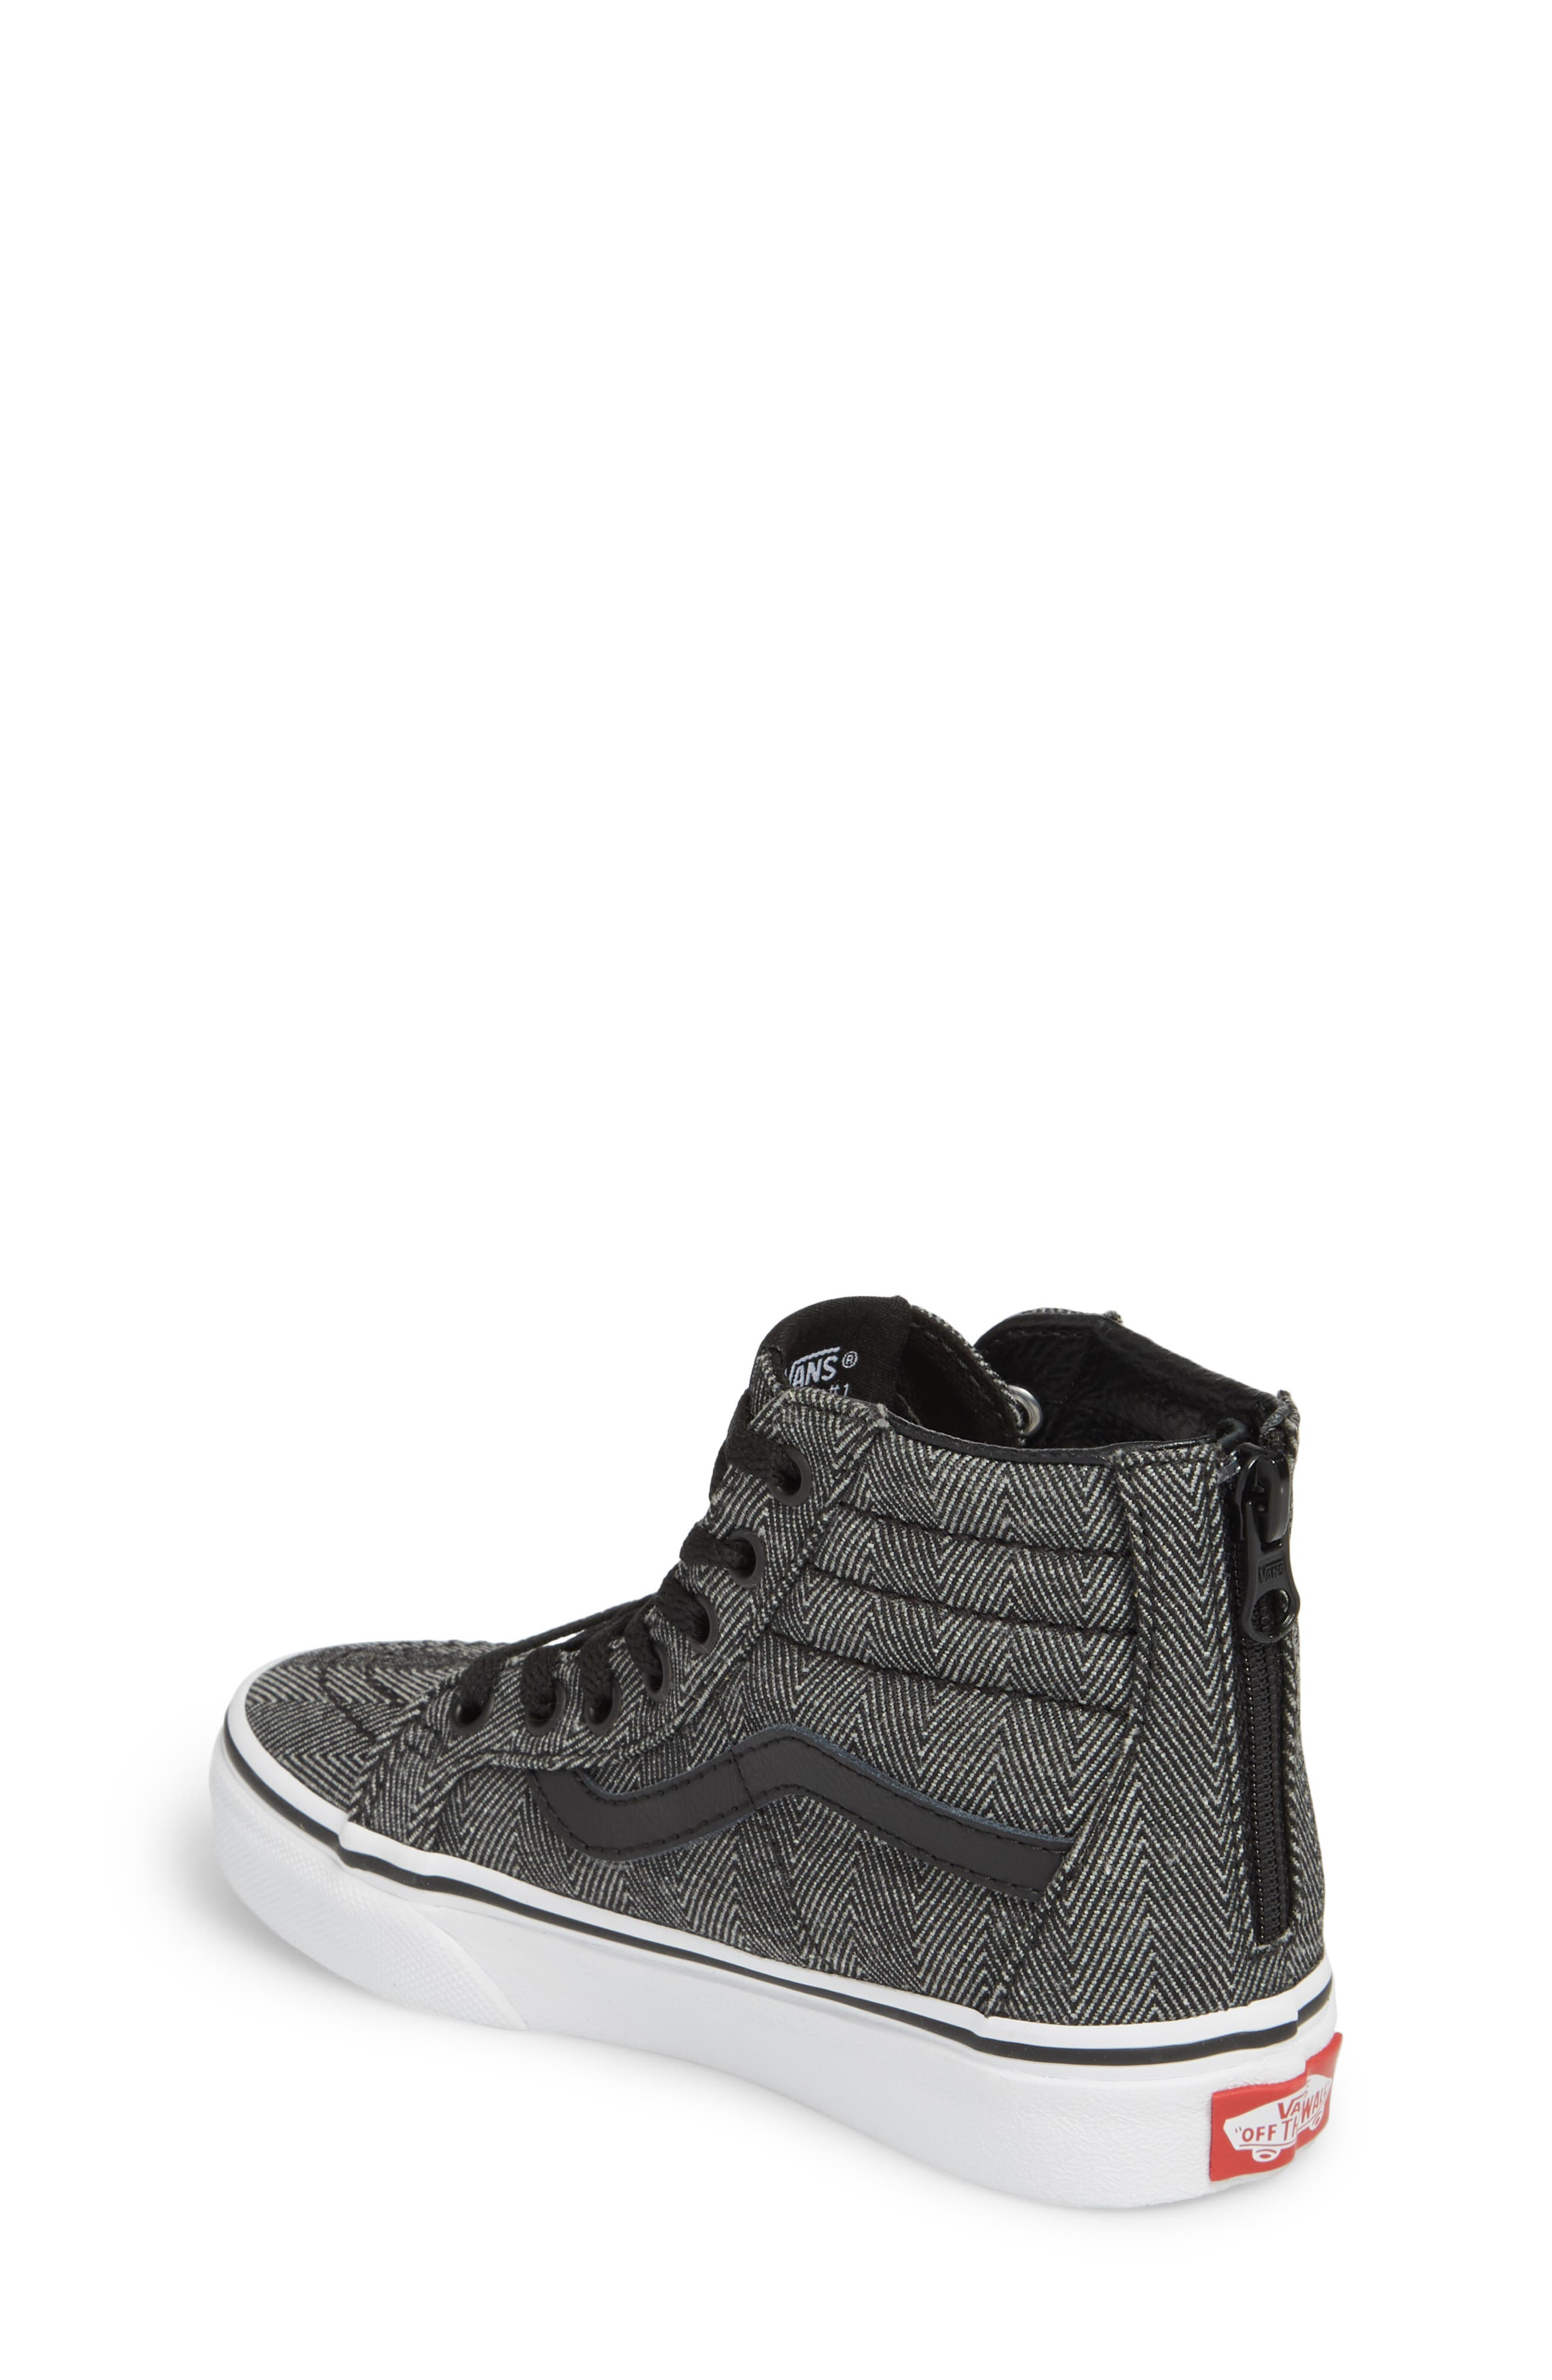 'Sk8-Hi' Sneaker,                             Alternate thumbnail 2, color,                             HERRINGBONE BLACK/ TRUE WHITE